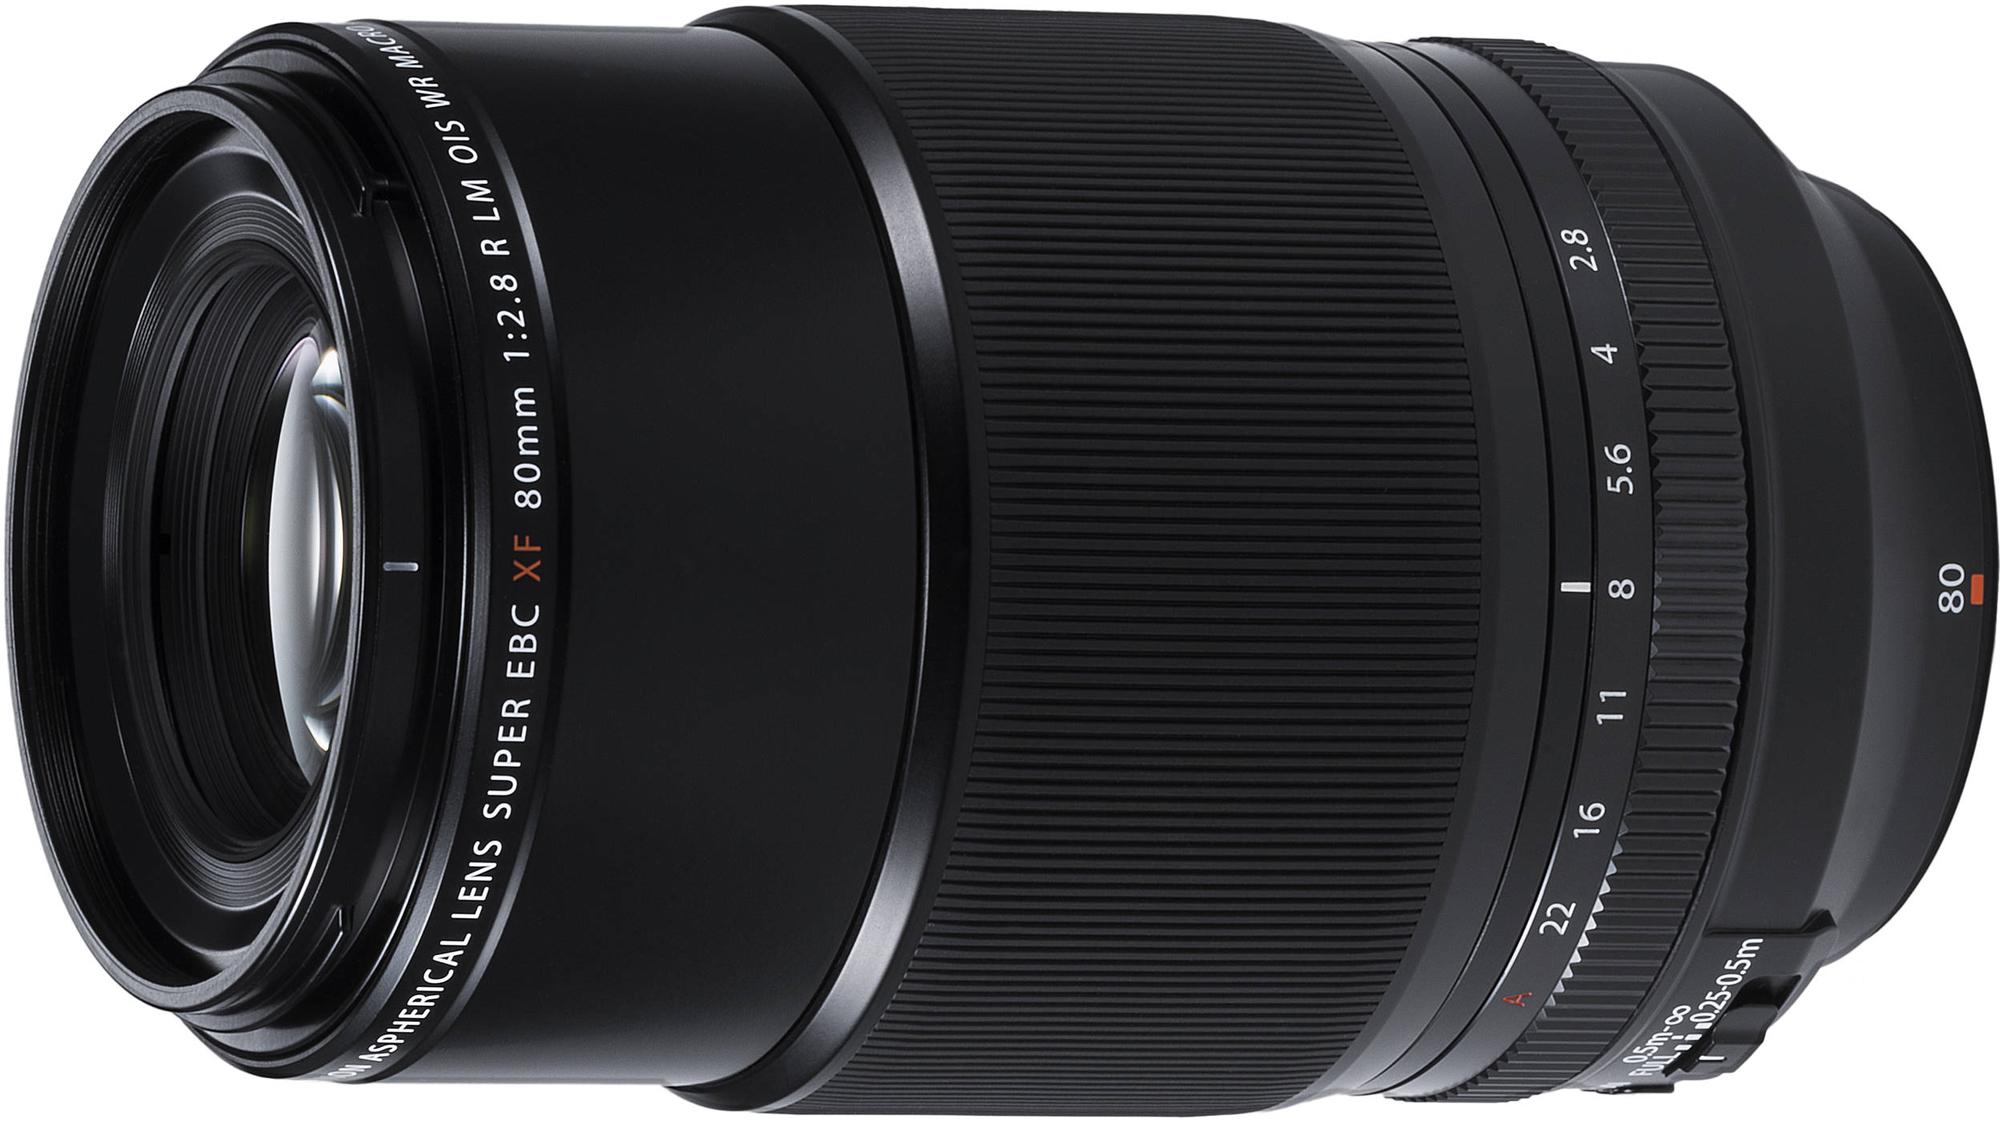 Best Fujifilm Lenses Of 2017 Bh Explora Fujinon Gf 120mm F 4 R Lm Ois Wr Macro Xf 80mm 28 Lens